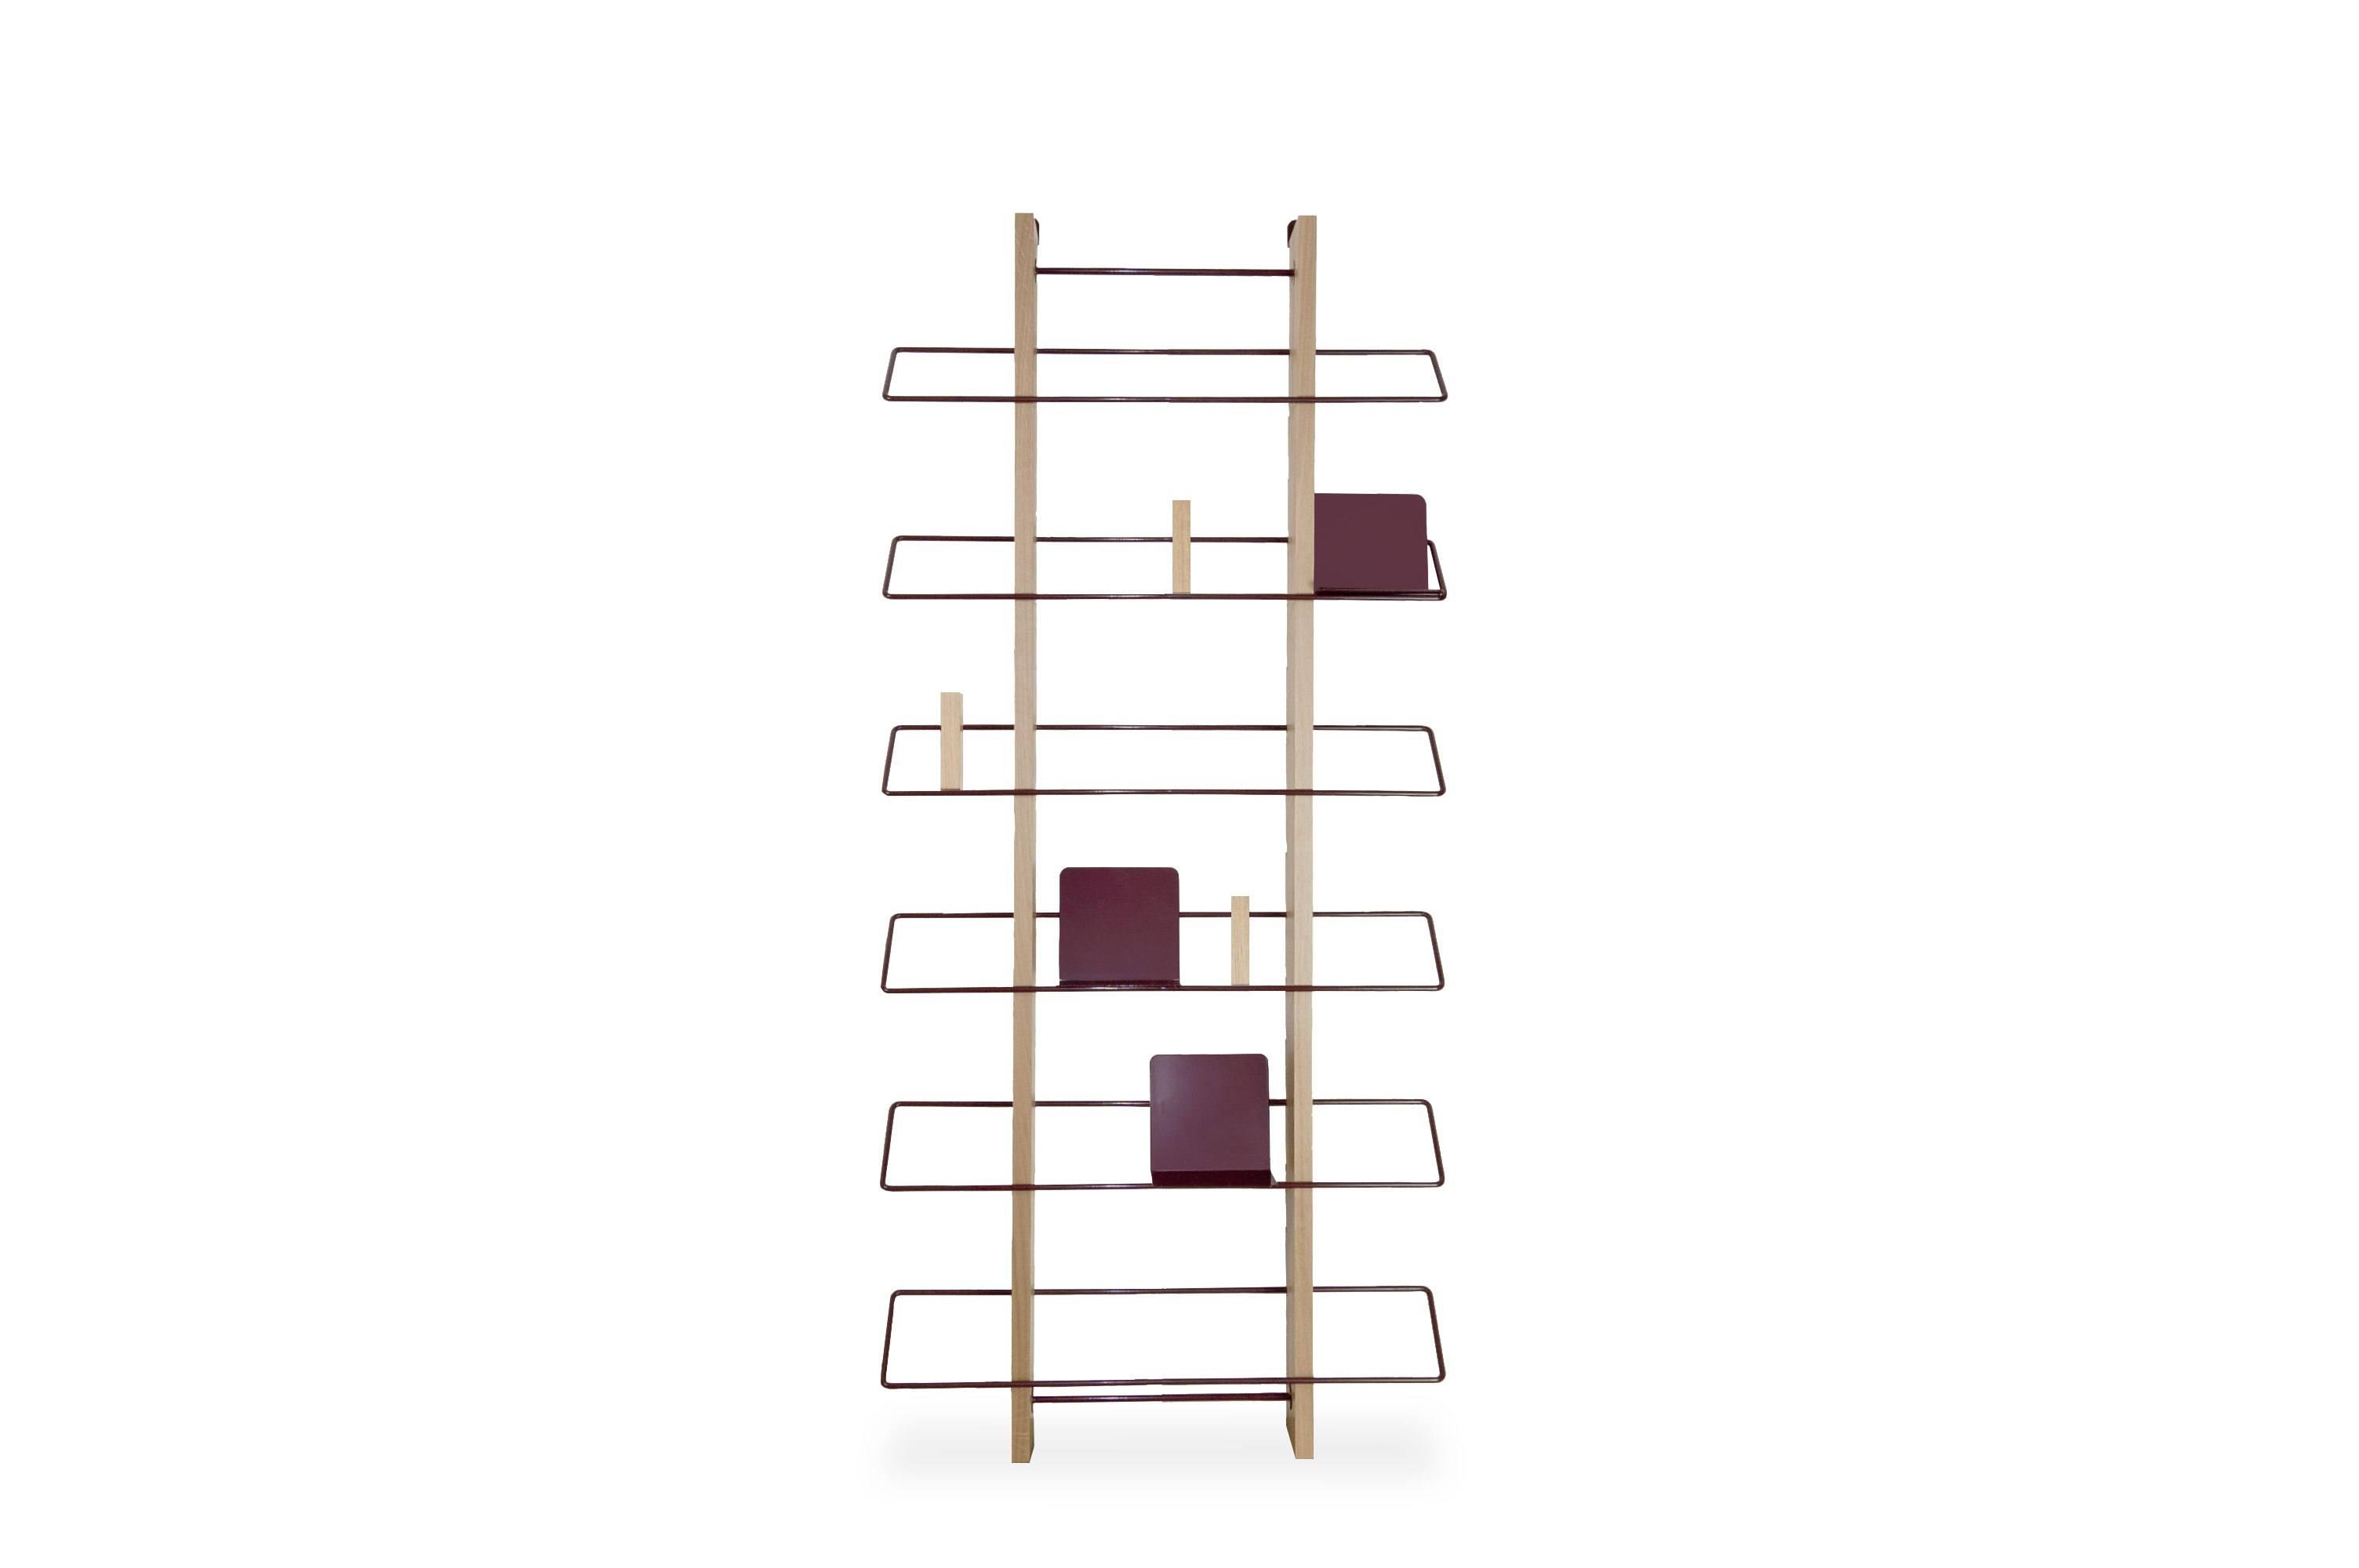 Grapevine Wooden Wall Bookshelf - Burgundy - merk: Edizione Limitata